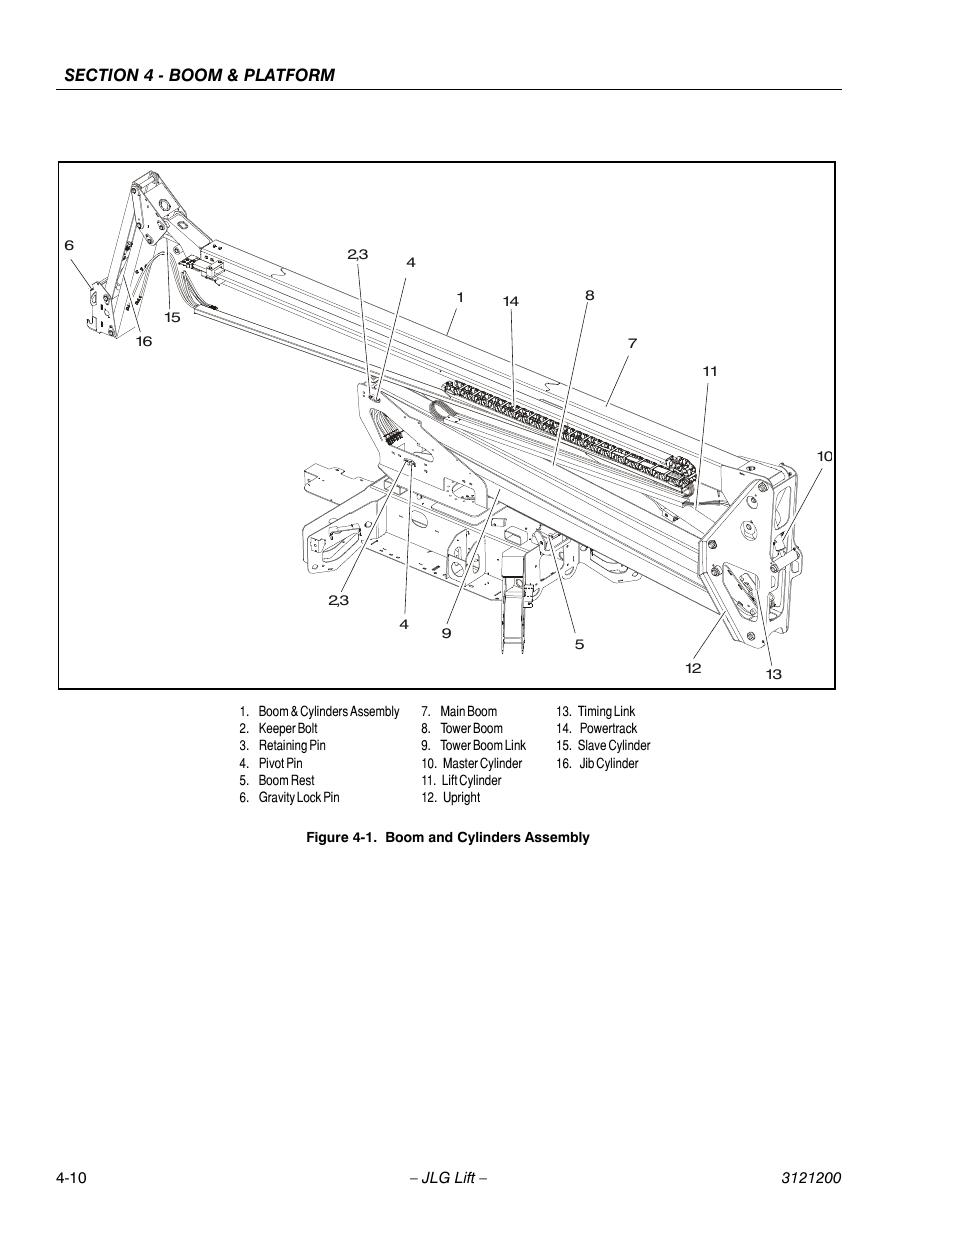 Jlg Scissor Lift Wiring Diagram - The Best Wiring Diagram 2017